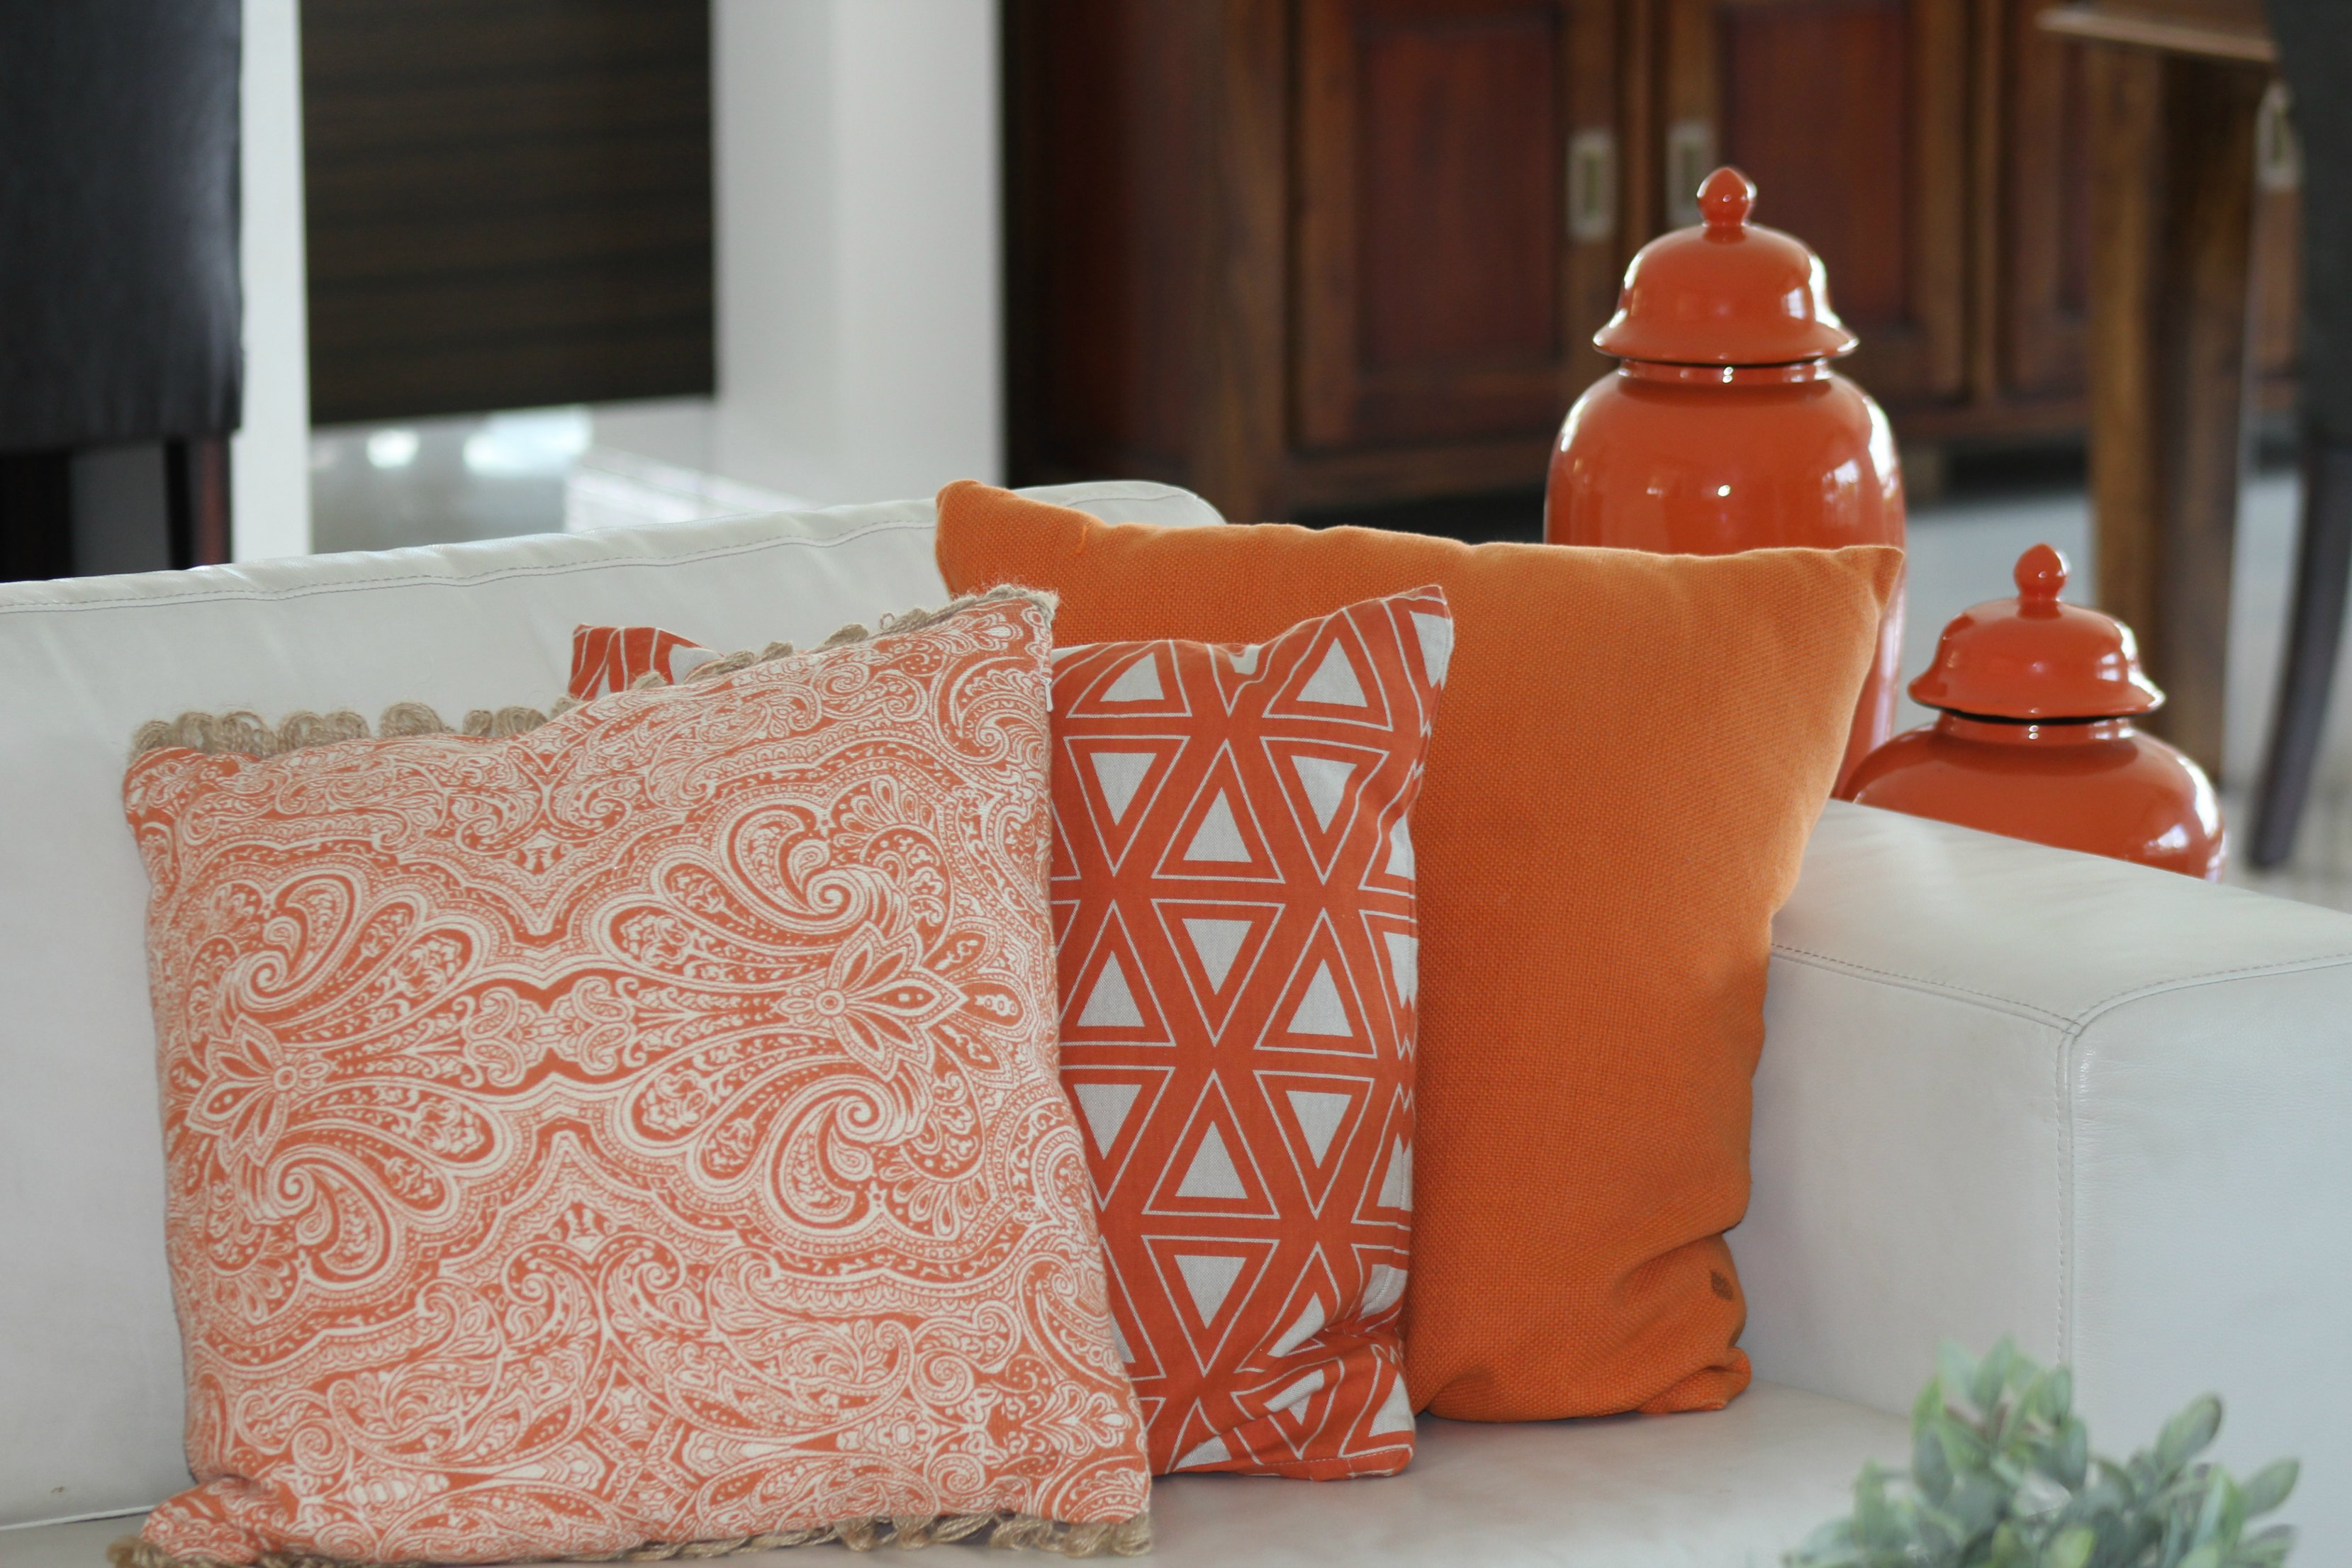 cushions smaller file.jpg